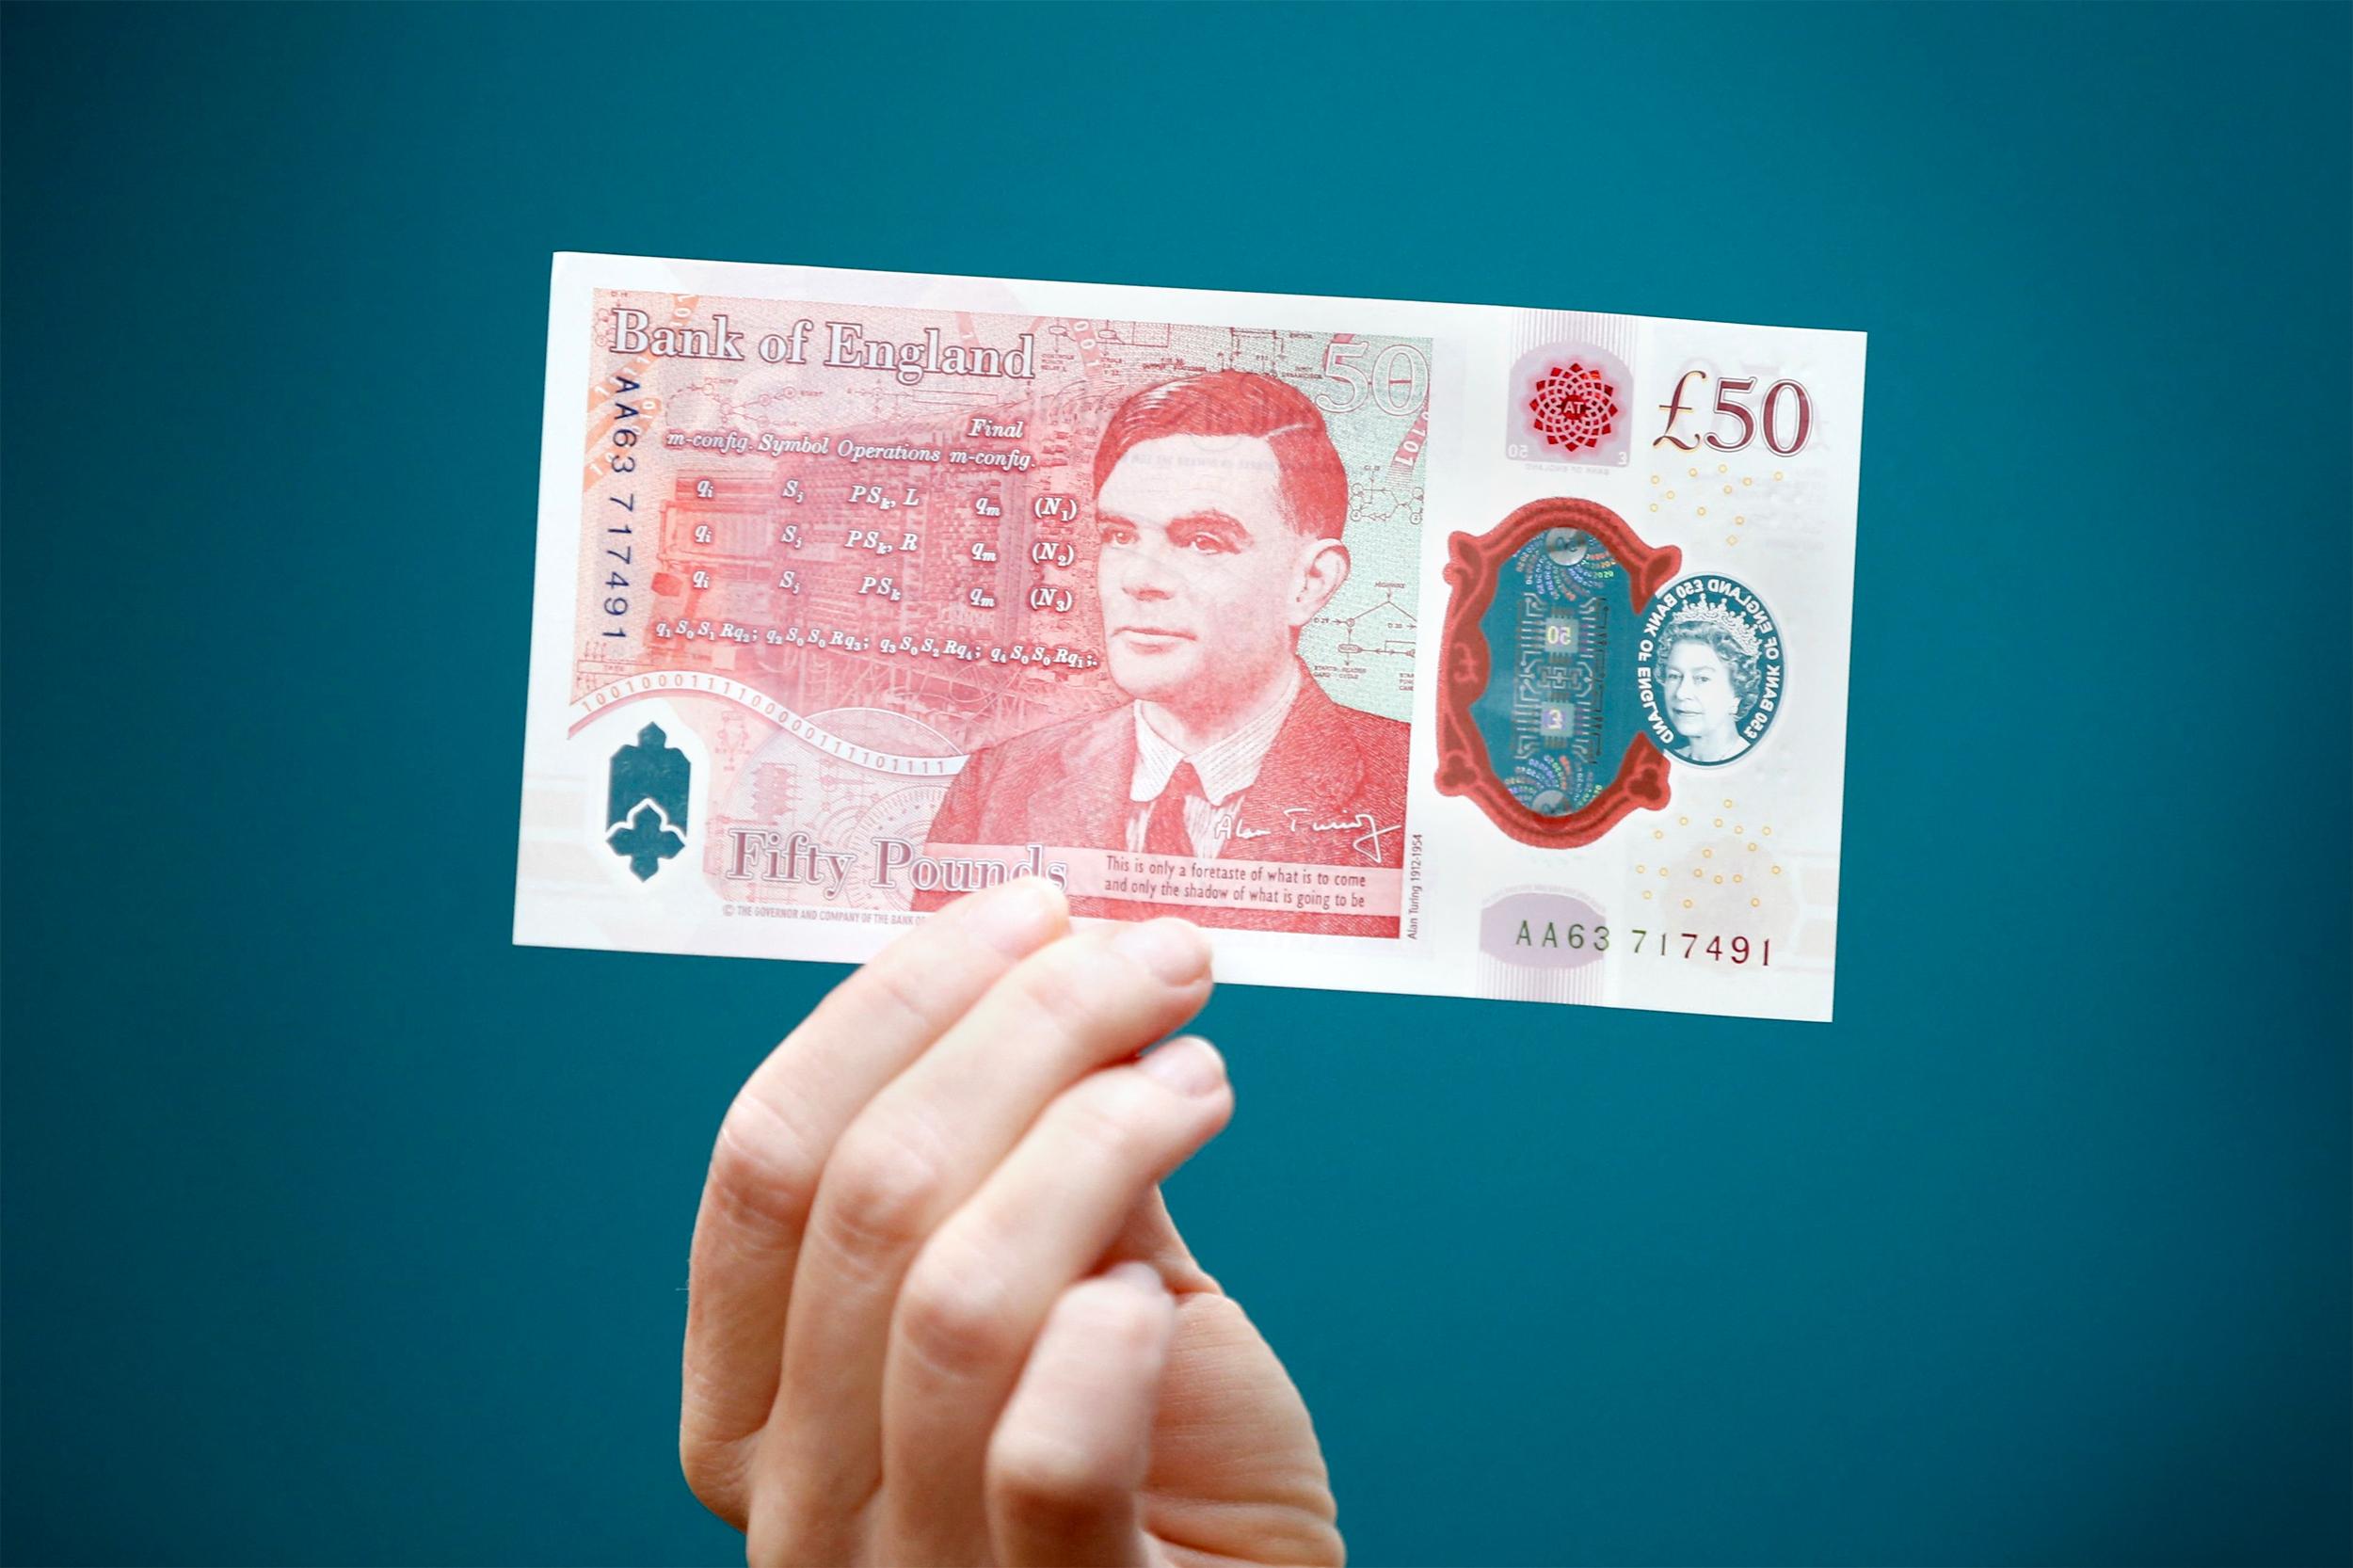 210623-alan-turing-50-pound-note-ew-1026a-57efb5.jpg